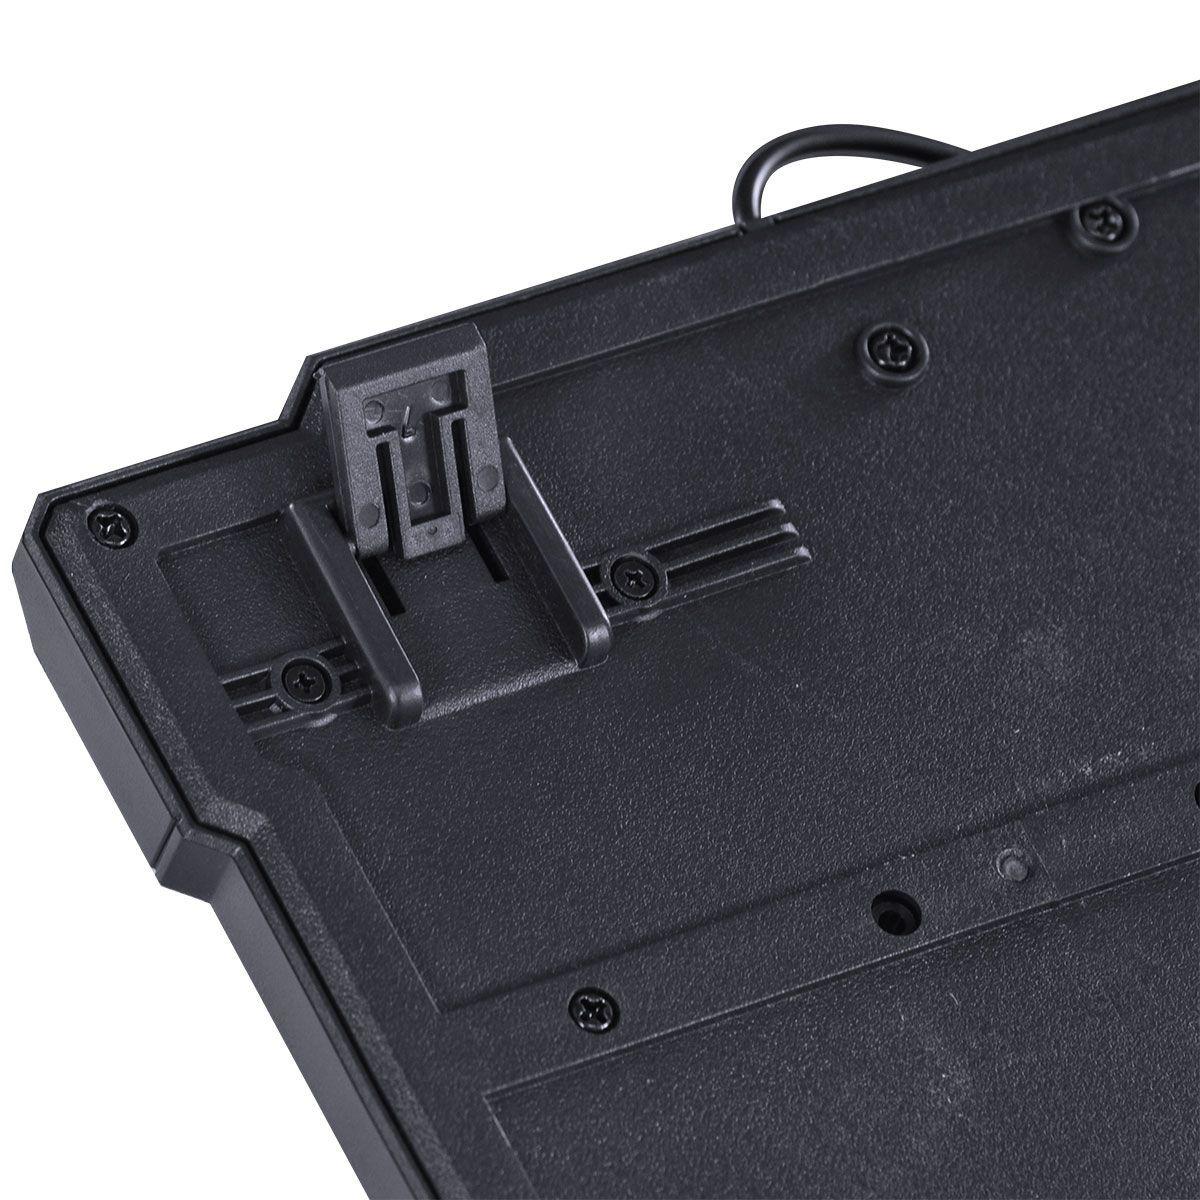 TECLADO USB GAMER VX GAMING DRAGON V2 ABNT2 1.8M PRETO COM VERDE - GT104